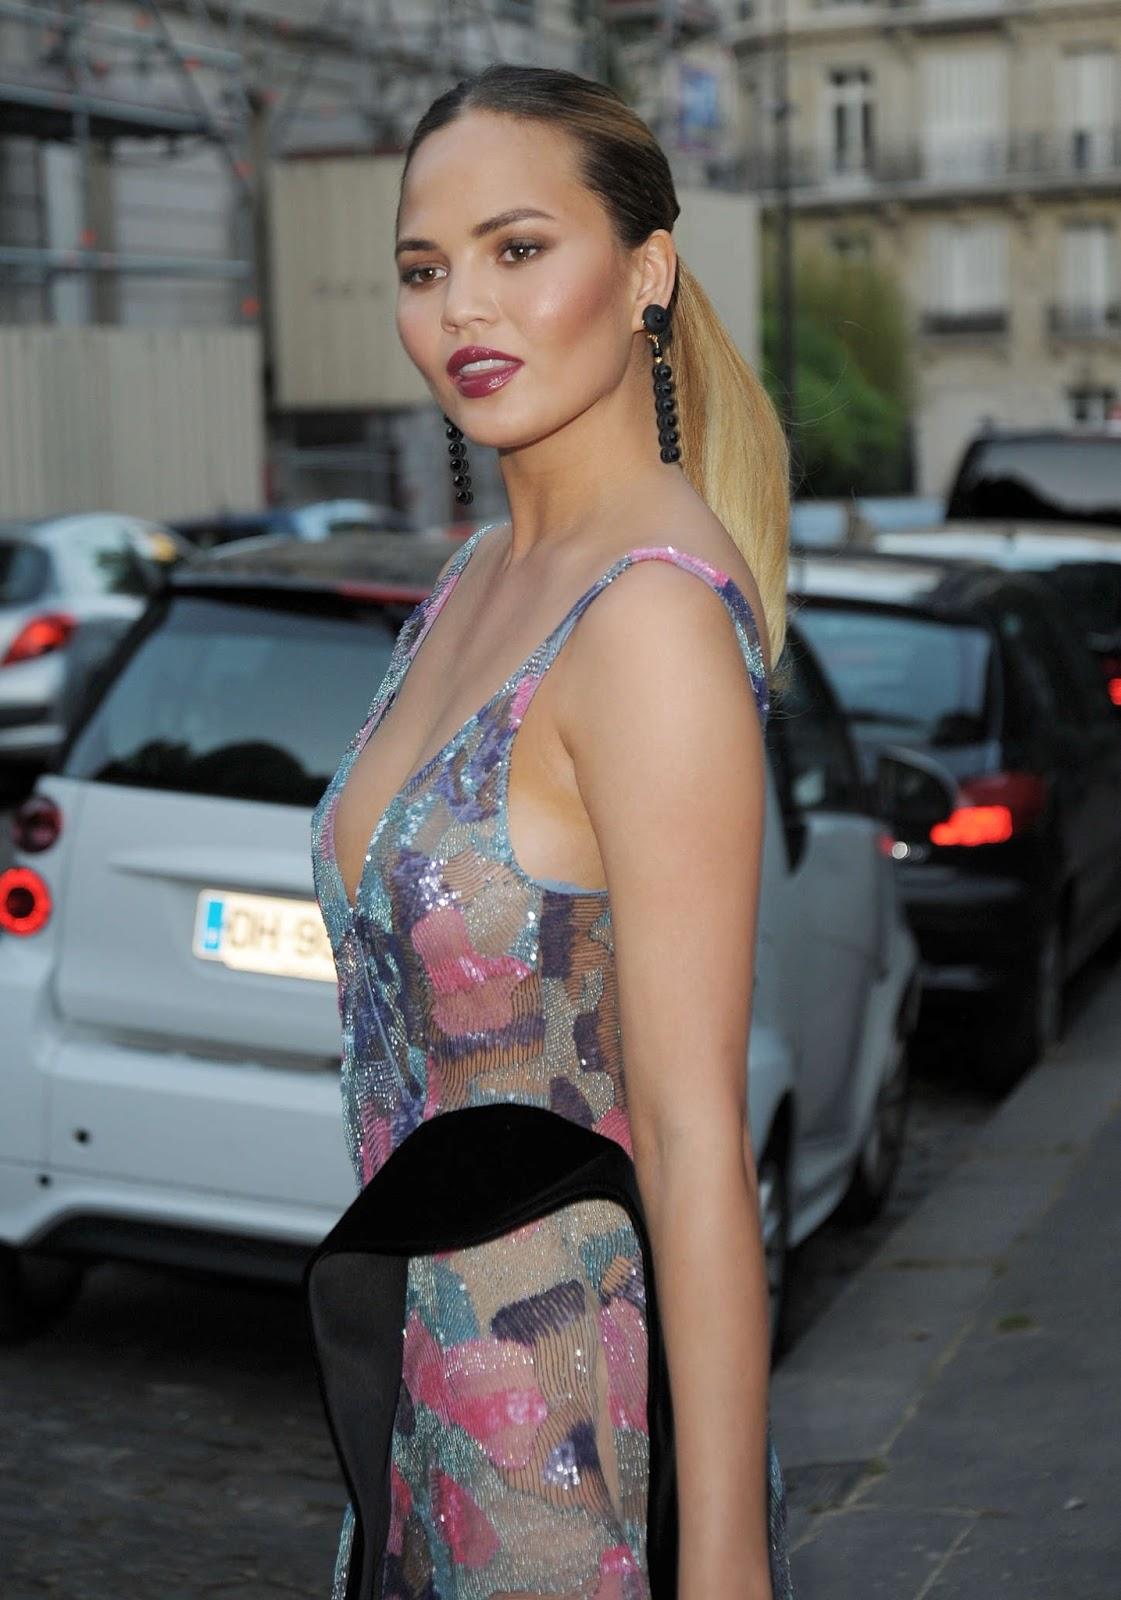 Emilia Clarke: Terminator Genisys Premiere